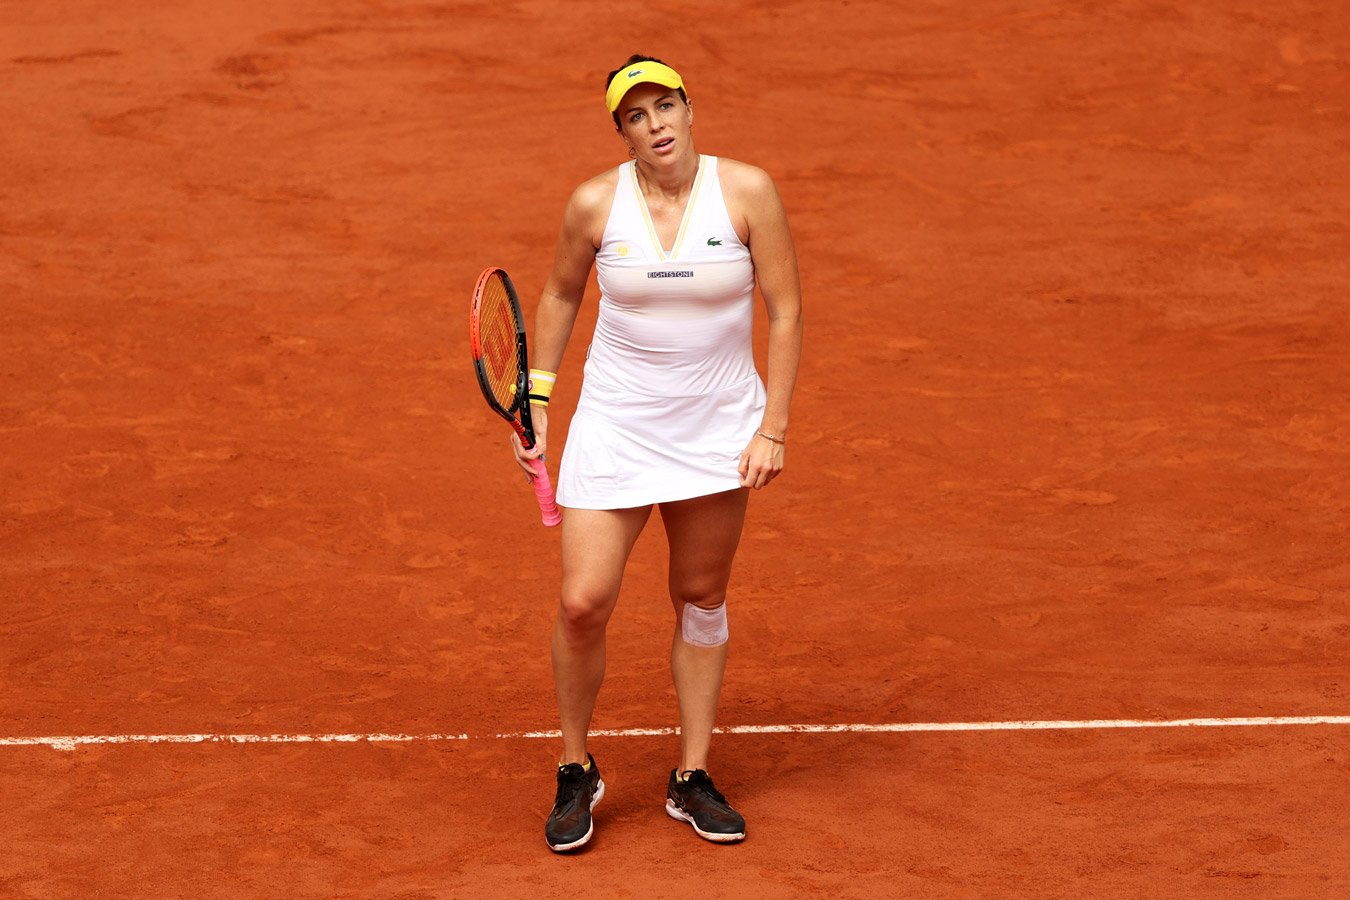 Павлюченкова не сумела завоевать титул на «Ролан Гаррос», проиграв Крейчиковой в финале